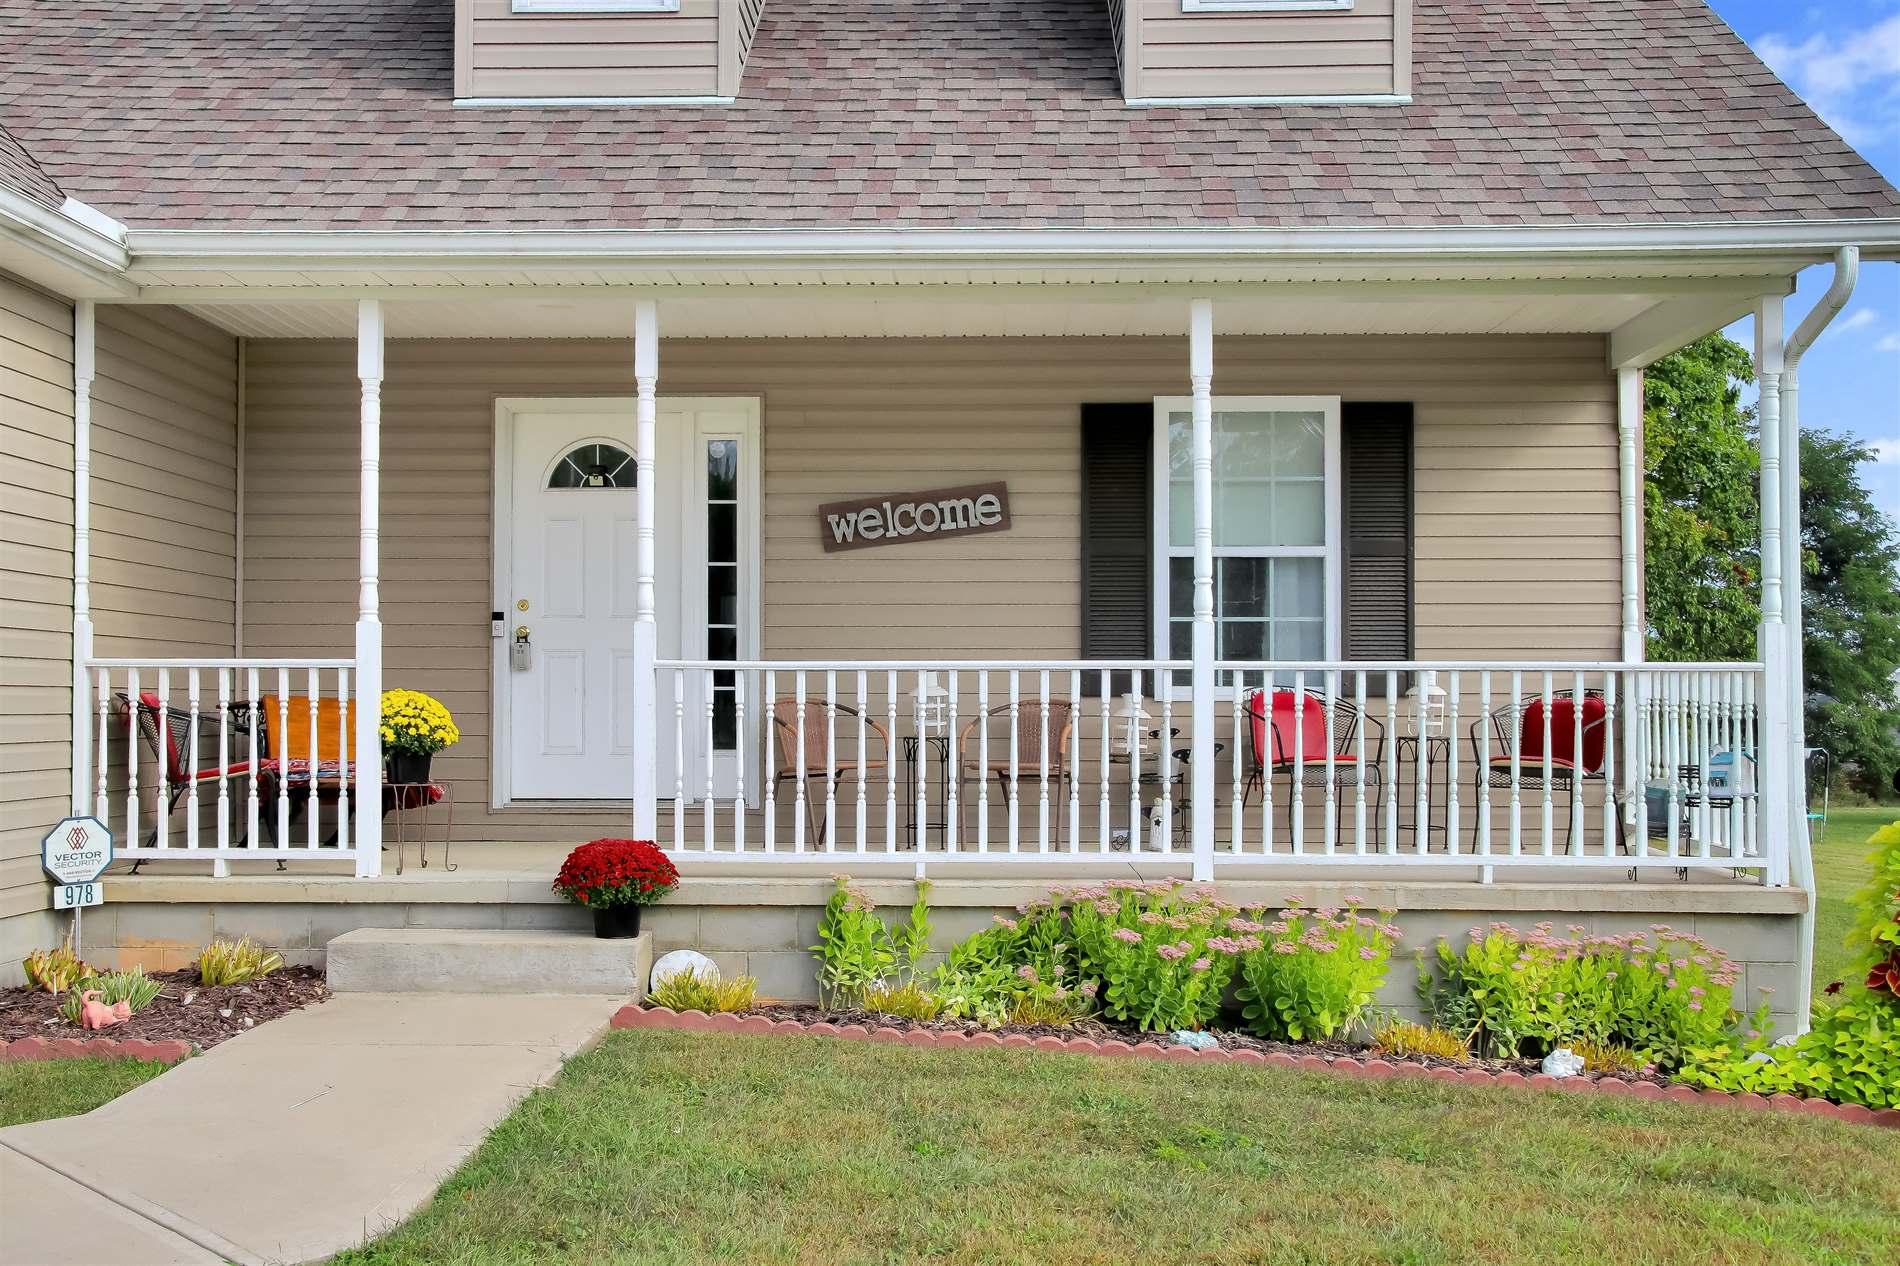 978 Twp Rd 1514, Ashland, OH 44805